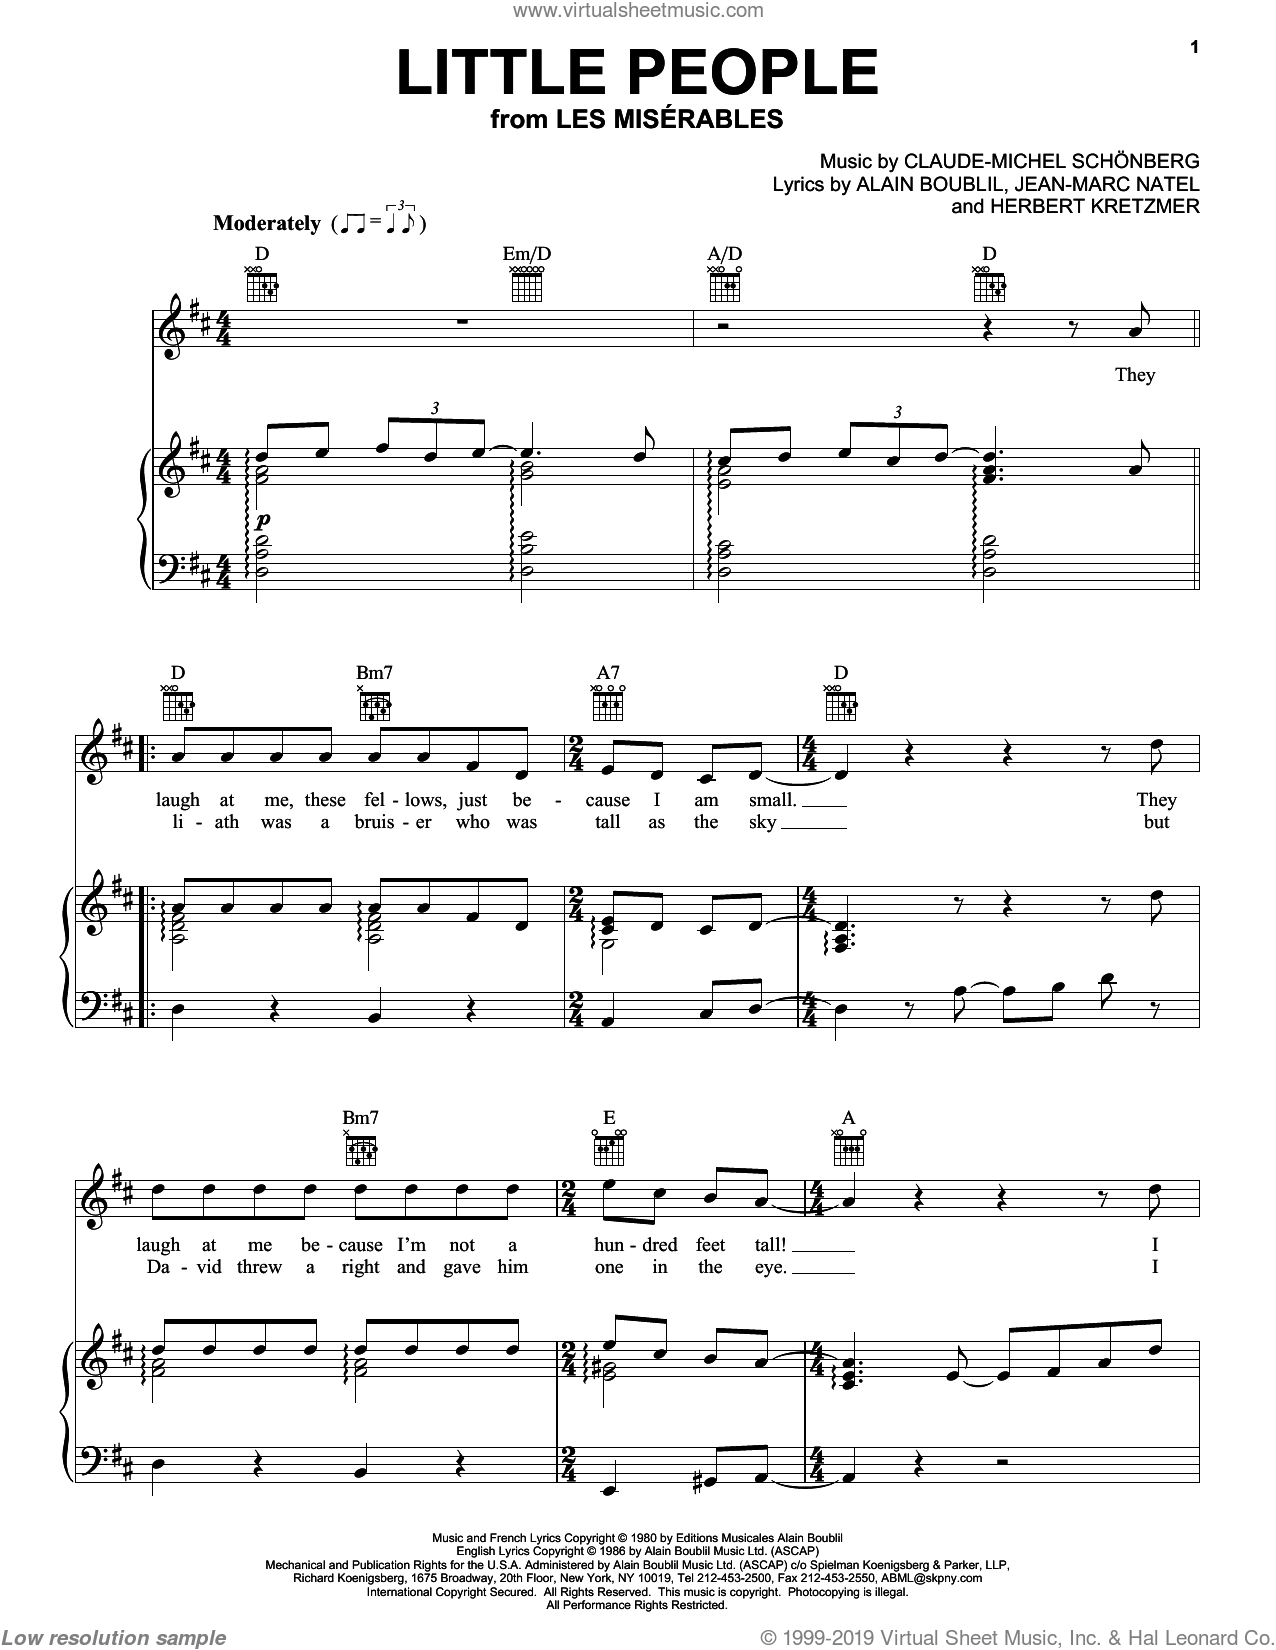 Little People sheet music for voice, piano or guitar by Alain Boublil, Les Miserables (Musical), Claude-Michel Schonberg, Herbert Kretzmer and Jean-Marc Natel, intermediate skill level